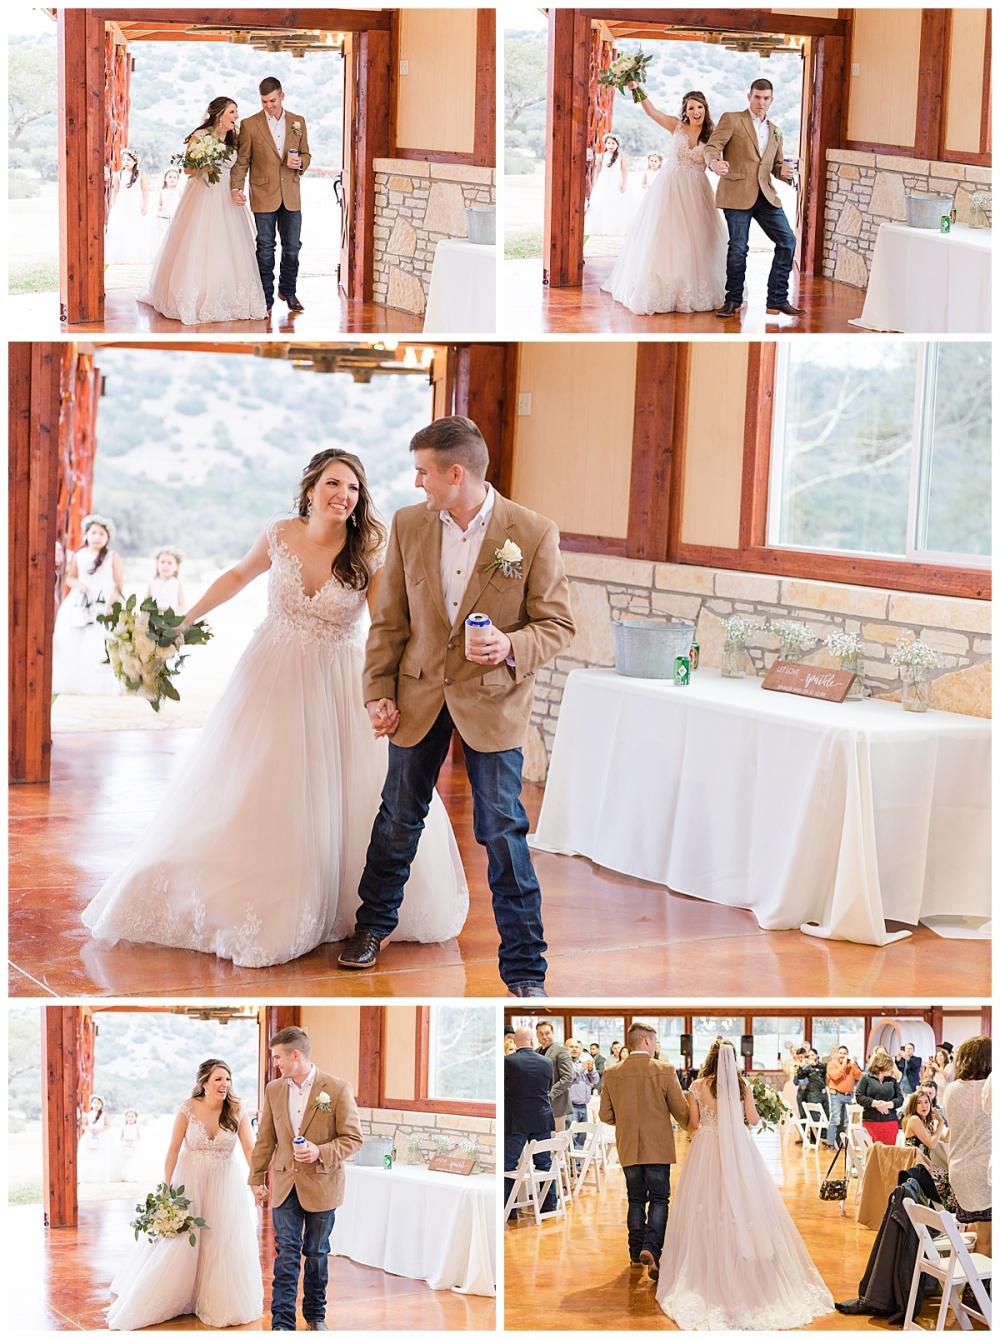 Wedding-Photographer-Texas-Hill-Country-Happy-H-Ranch-Comfor-Texas-Carly-Barton-Photography_0064.jpg